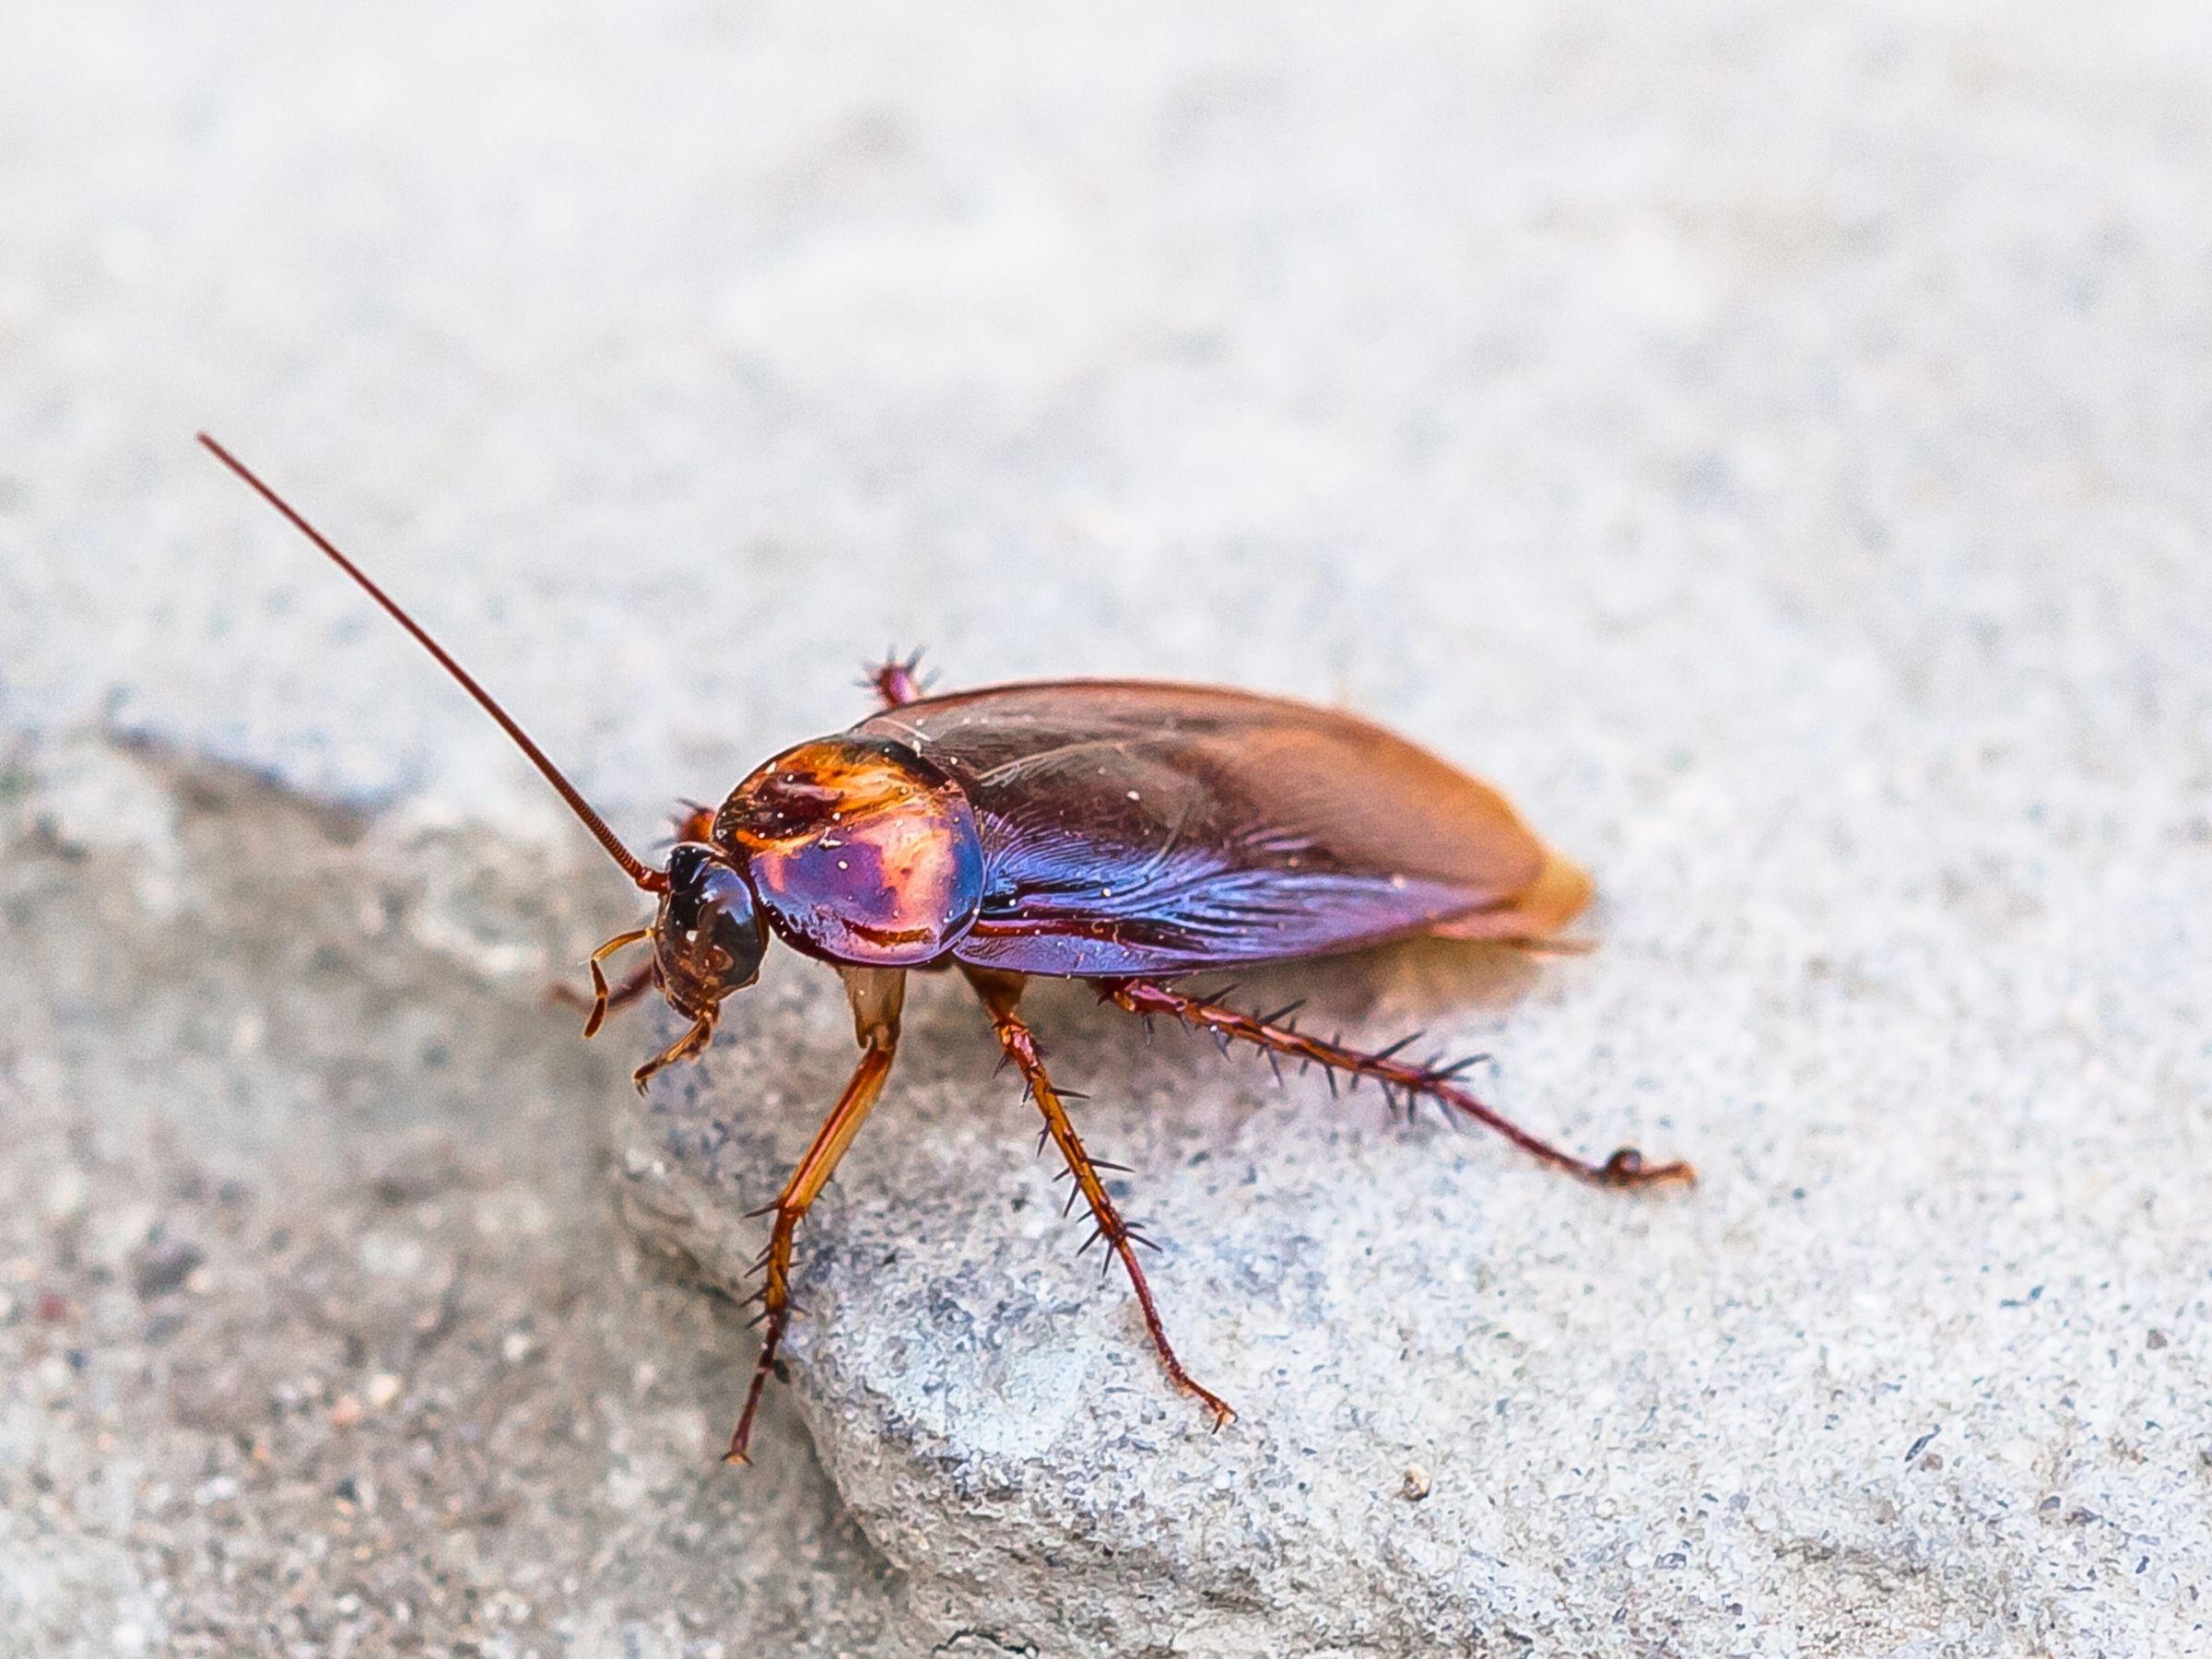 Indestructible Cockroach